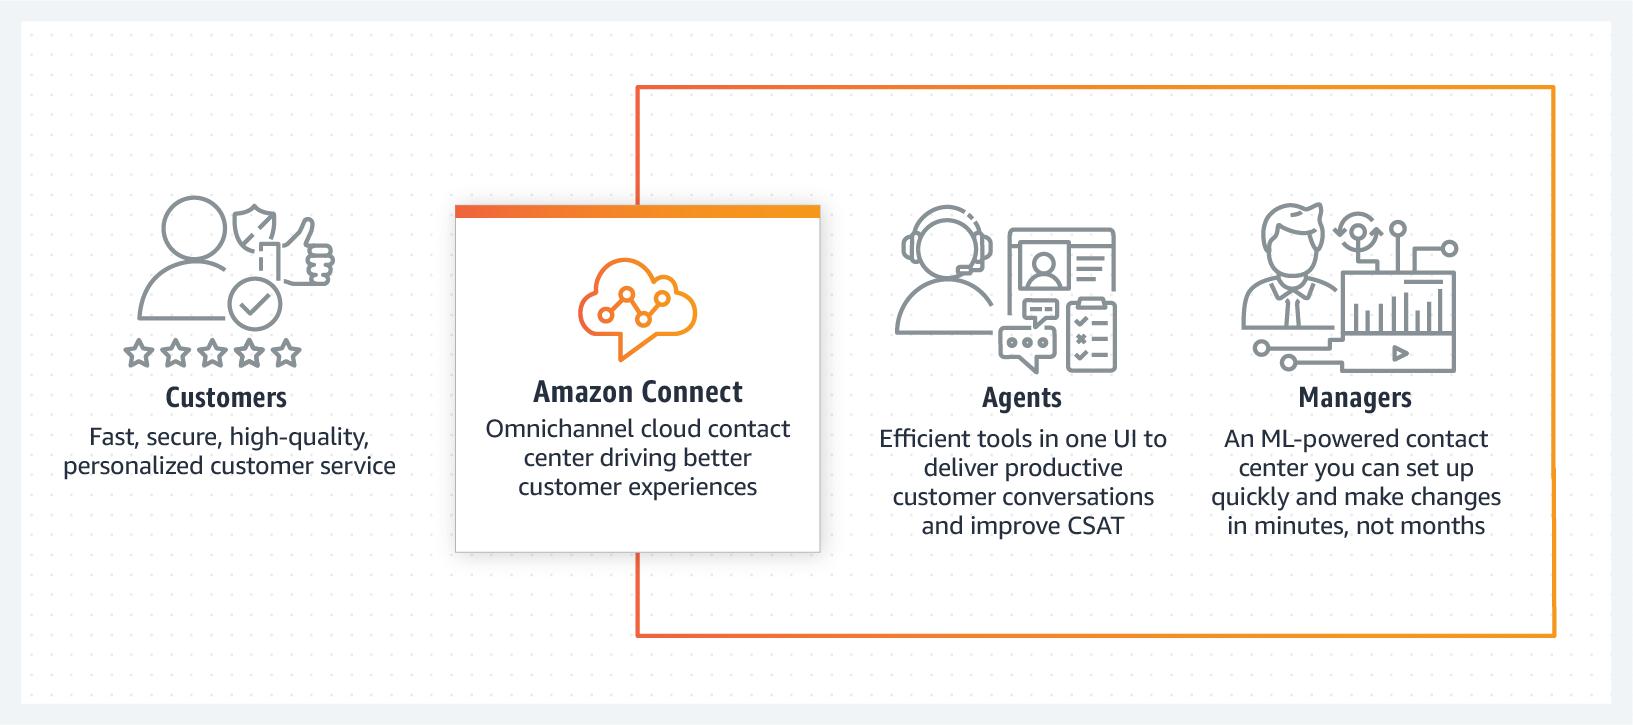 Amazon Connect Pasquale DeMaio on Democratizing the Contact Center